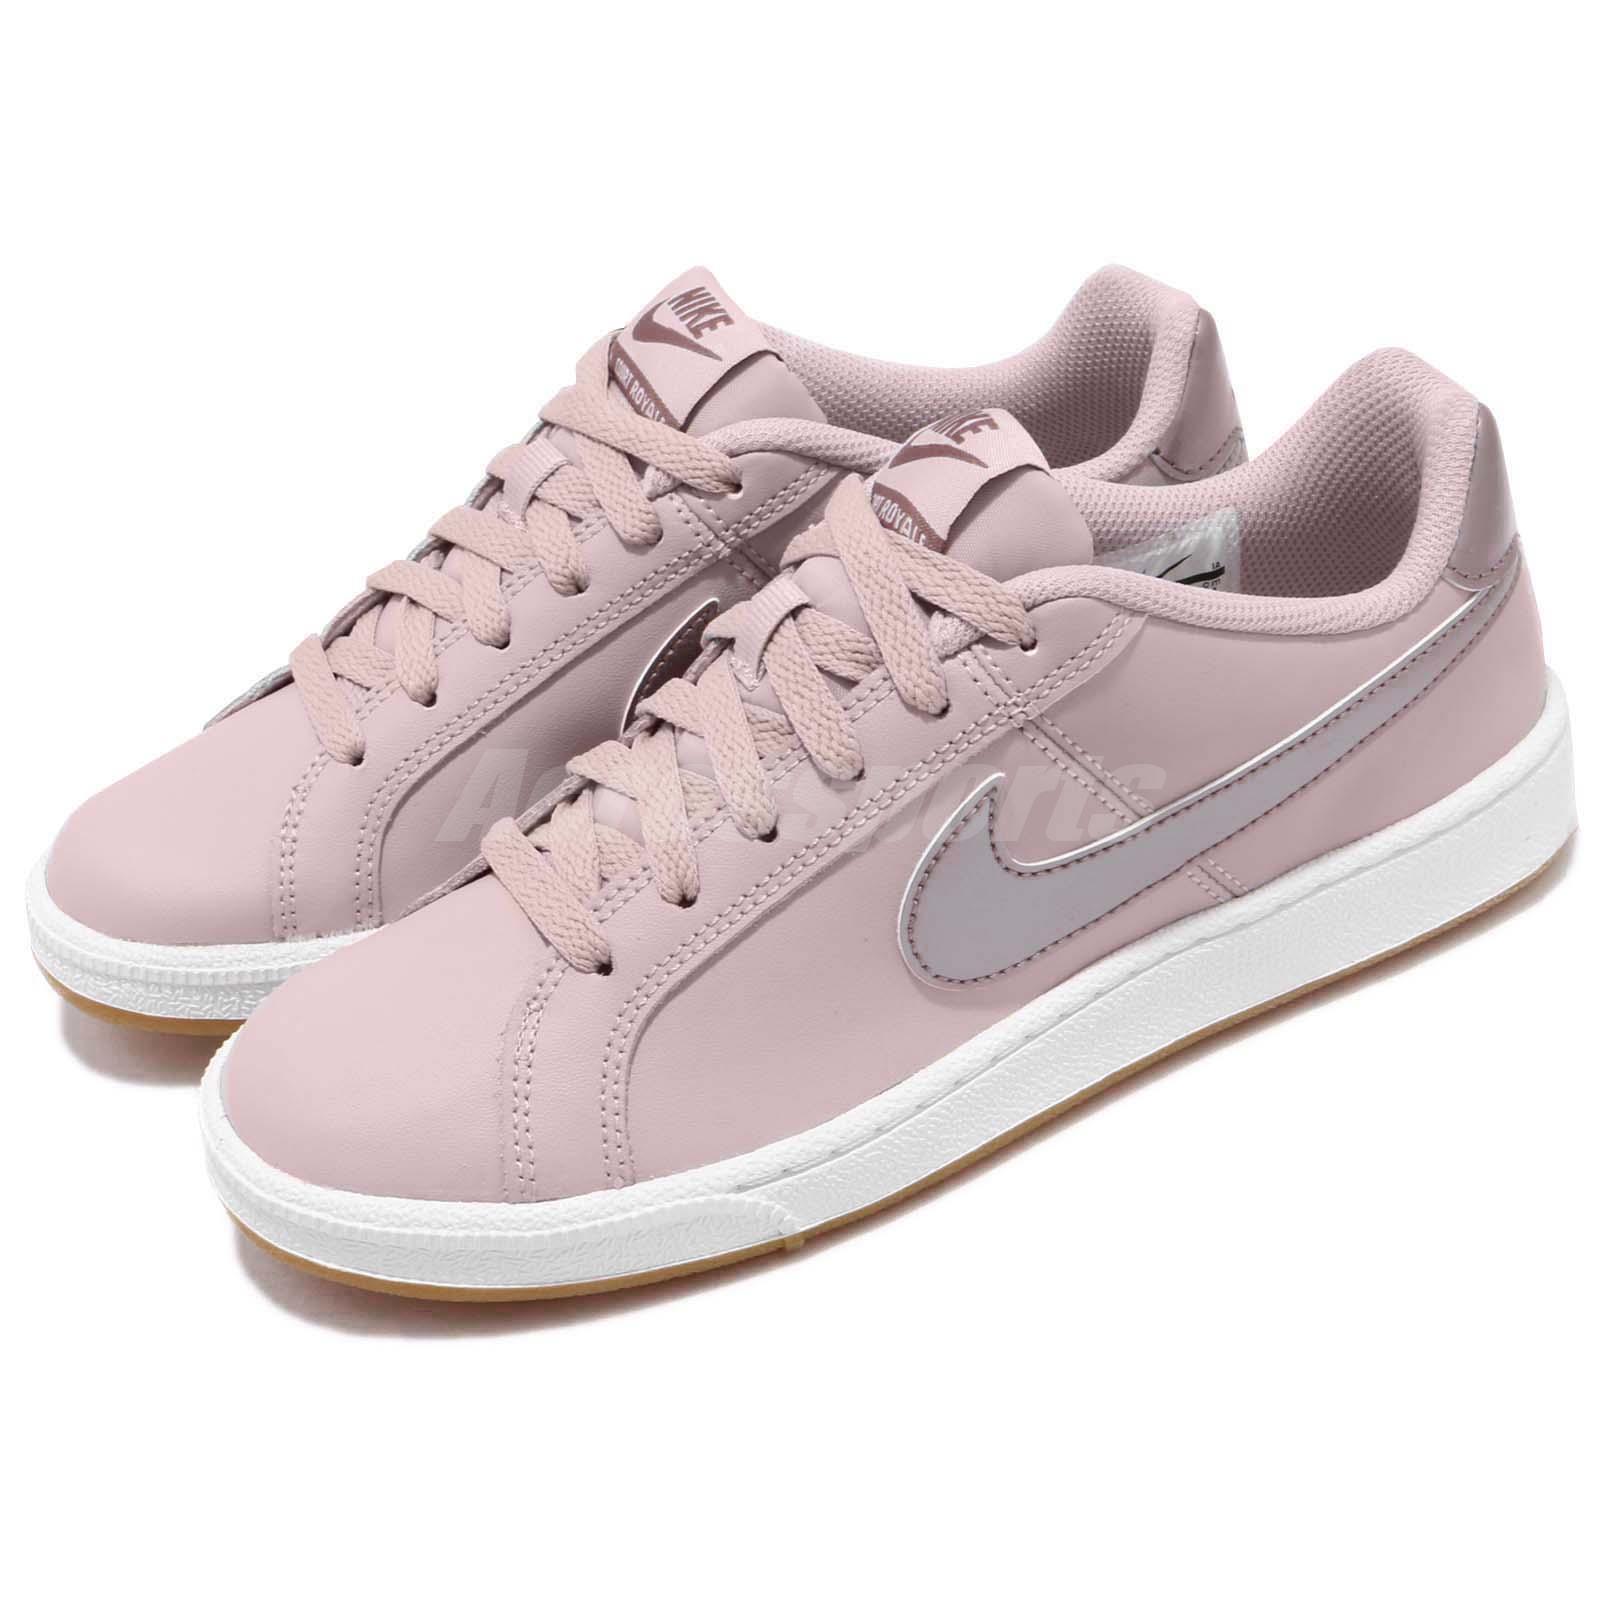 ac23bc703e80 Details about Nike Wmns Court Royale Particle Rose Pink Gum Women Shoes  Sneakers 749867-600